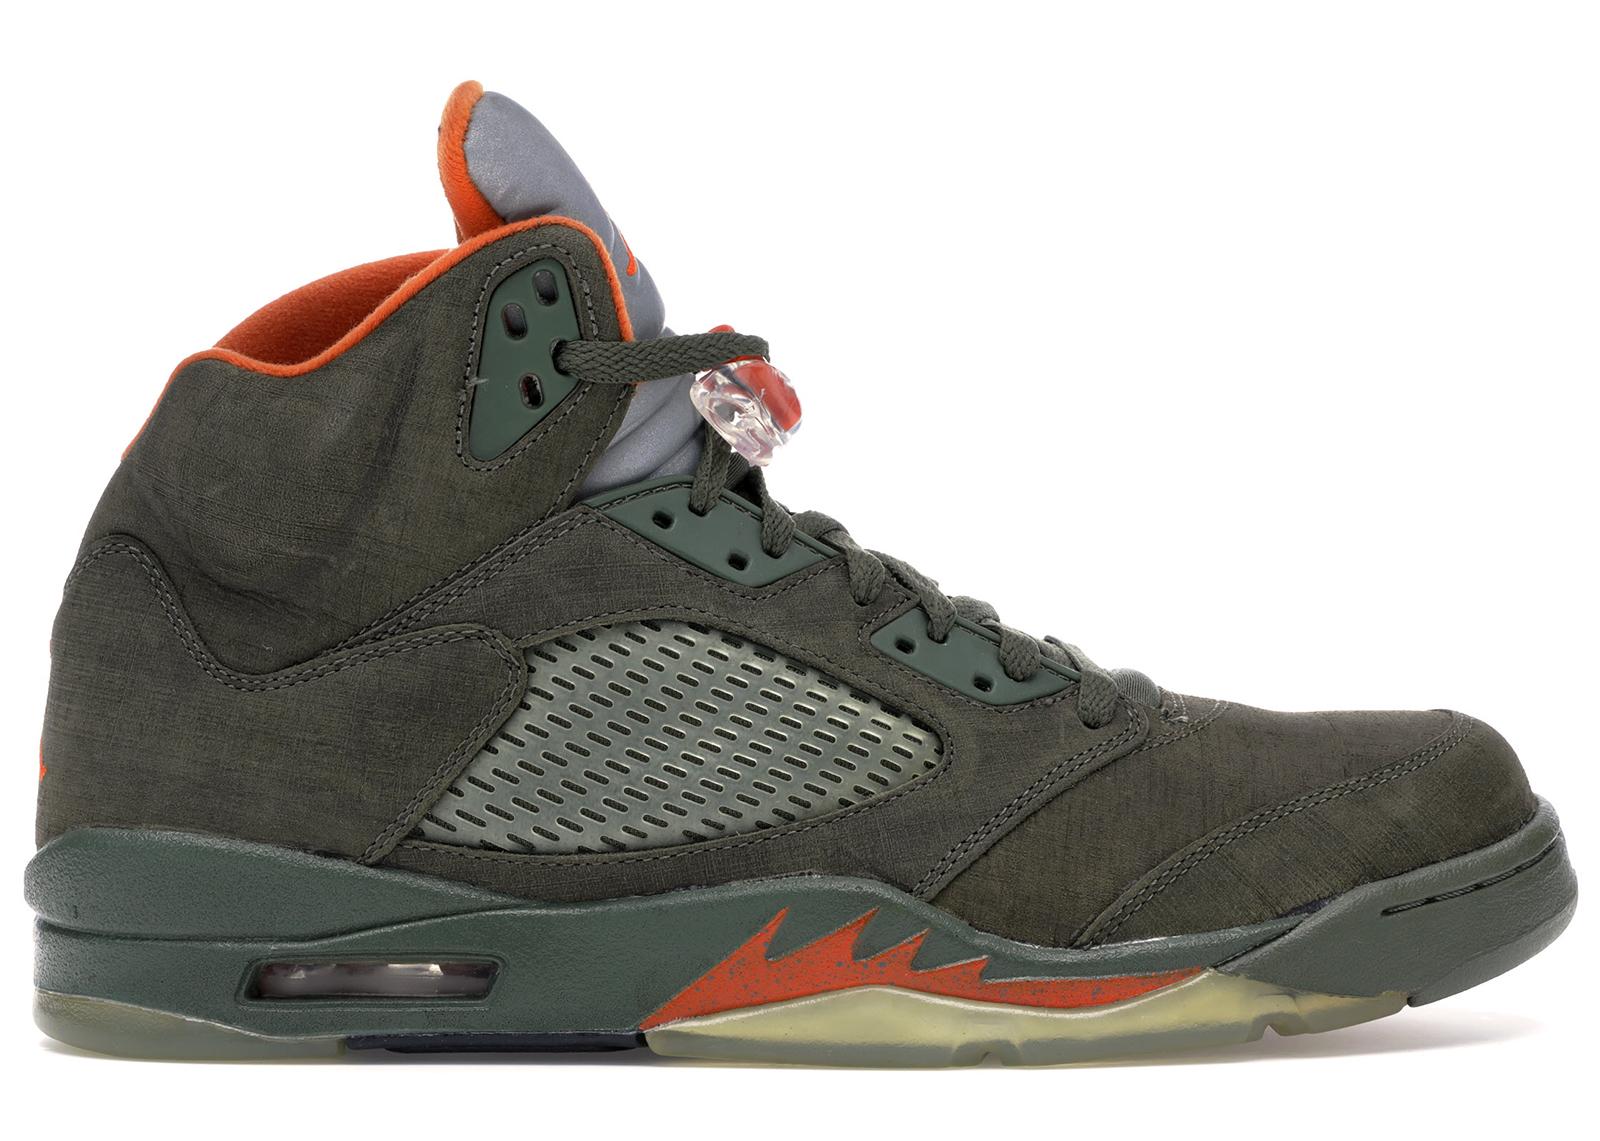 Jordan 5 Retro Olive - 314259-381